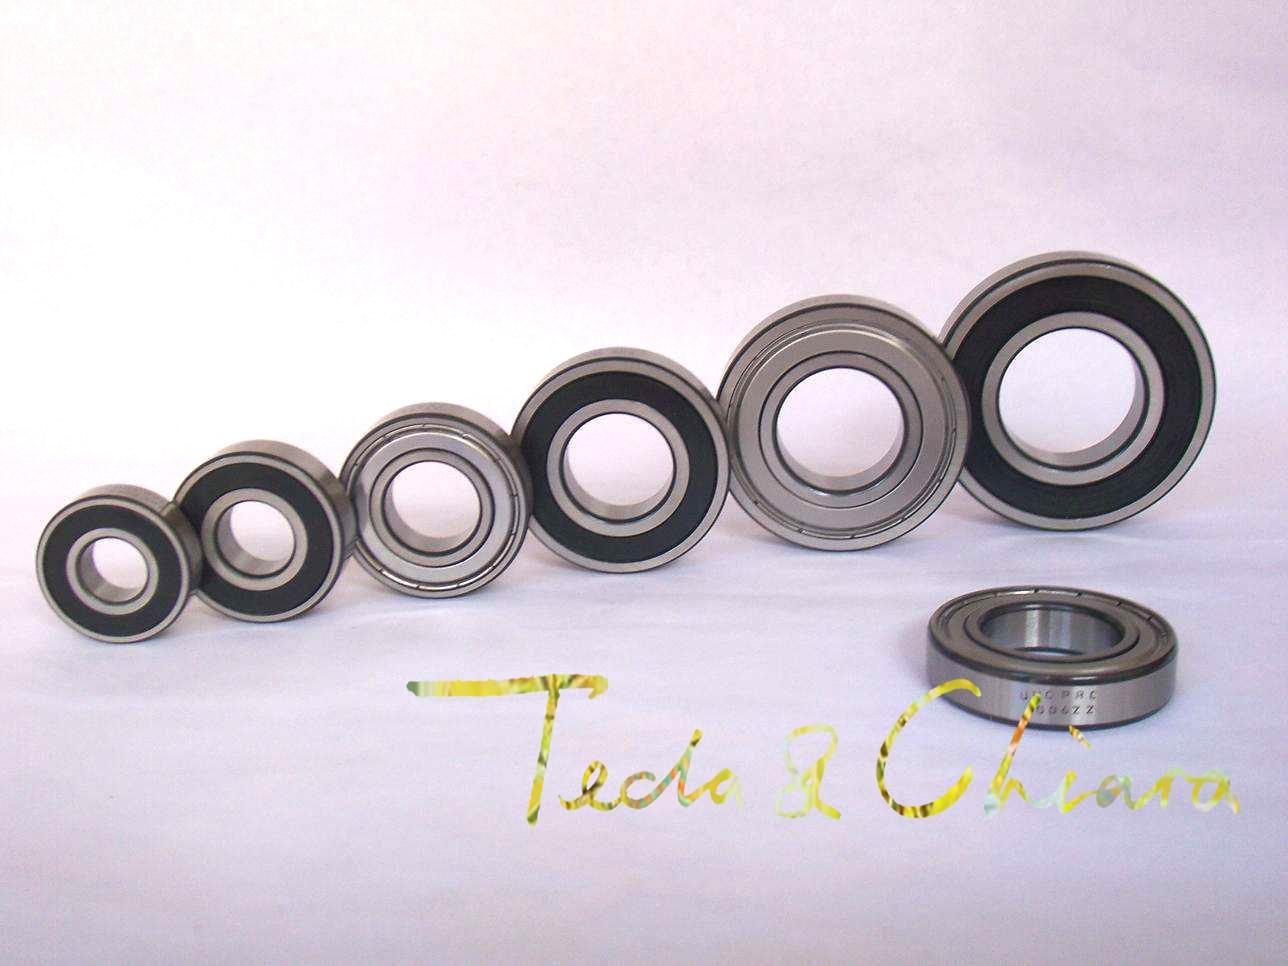 678RS 678ZZ MR128 MR128ZZ MR128RS MR128-2Z MR128-2RS 678 ZZ RS RZ 2RZ Deep Groove Ball Bearings 8 x 12 x 3.5mm High Quality gcr15 6326 zz or 6326 2rs 130x280x58mm high precision deep groove ball bearings abec 1 p0